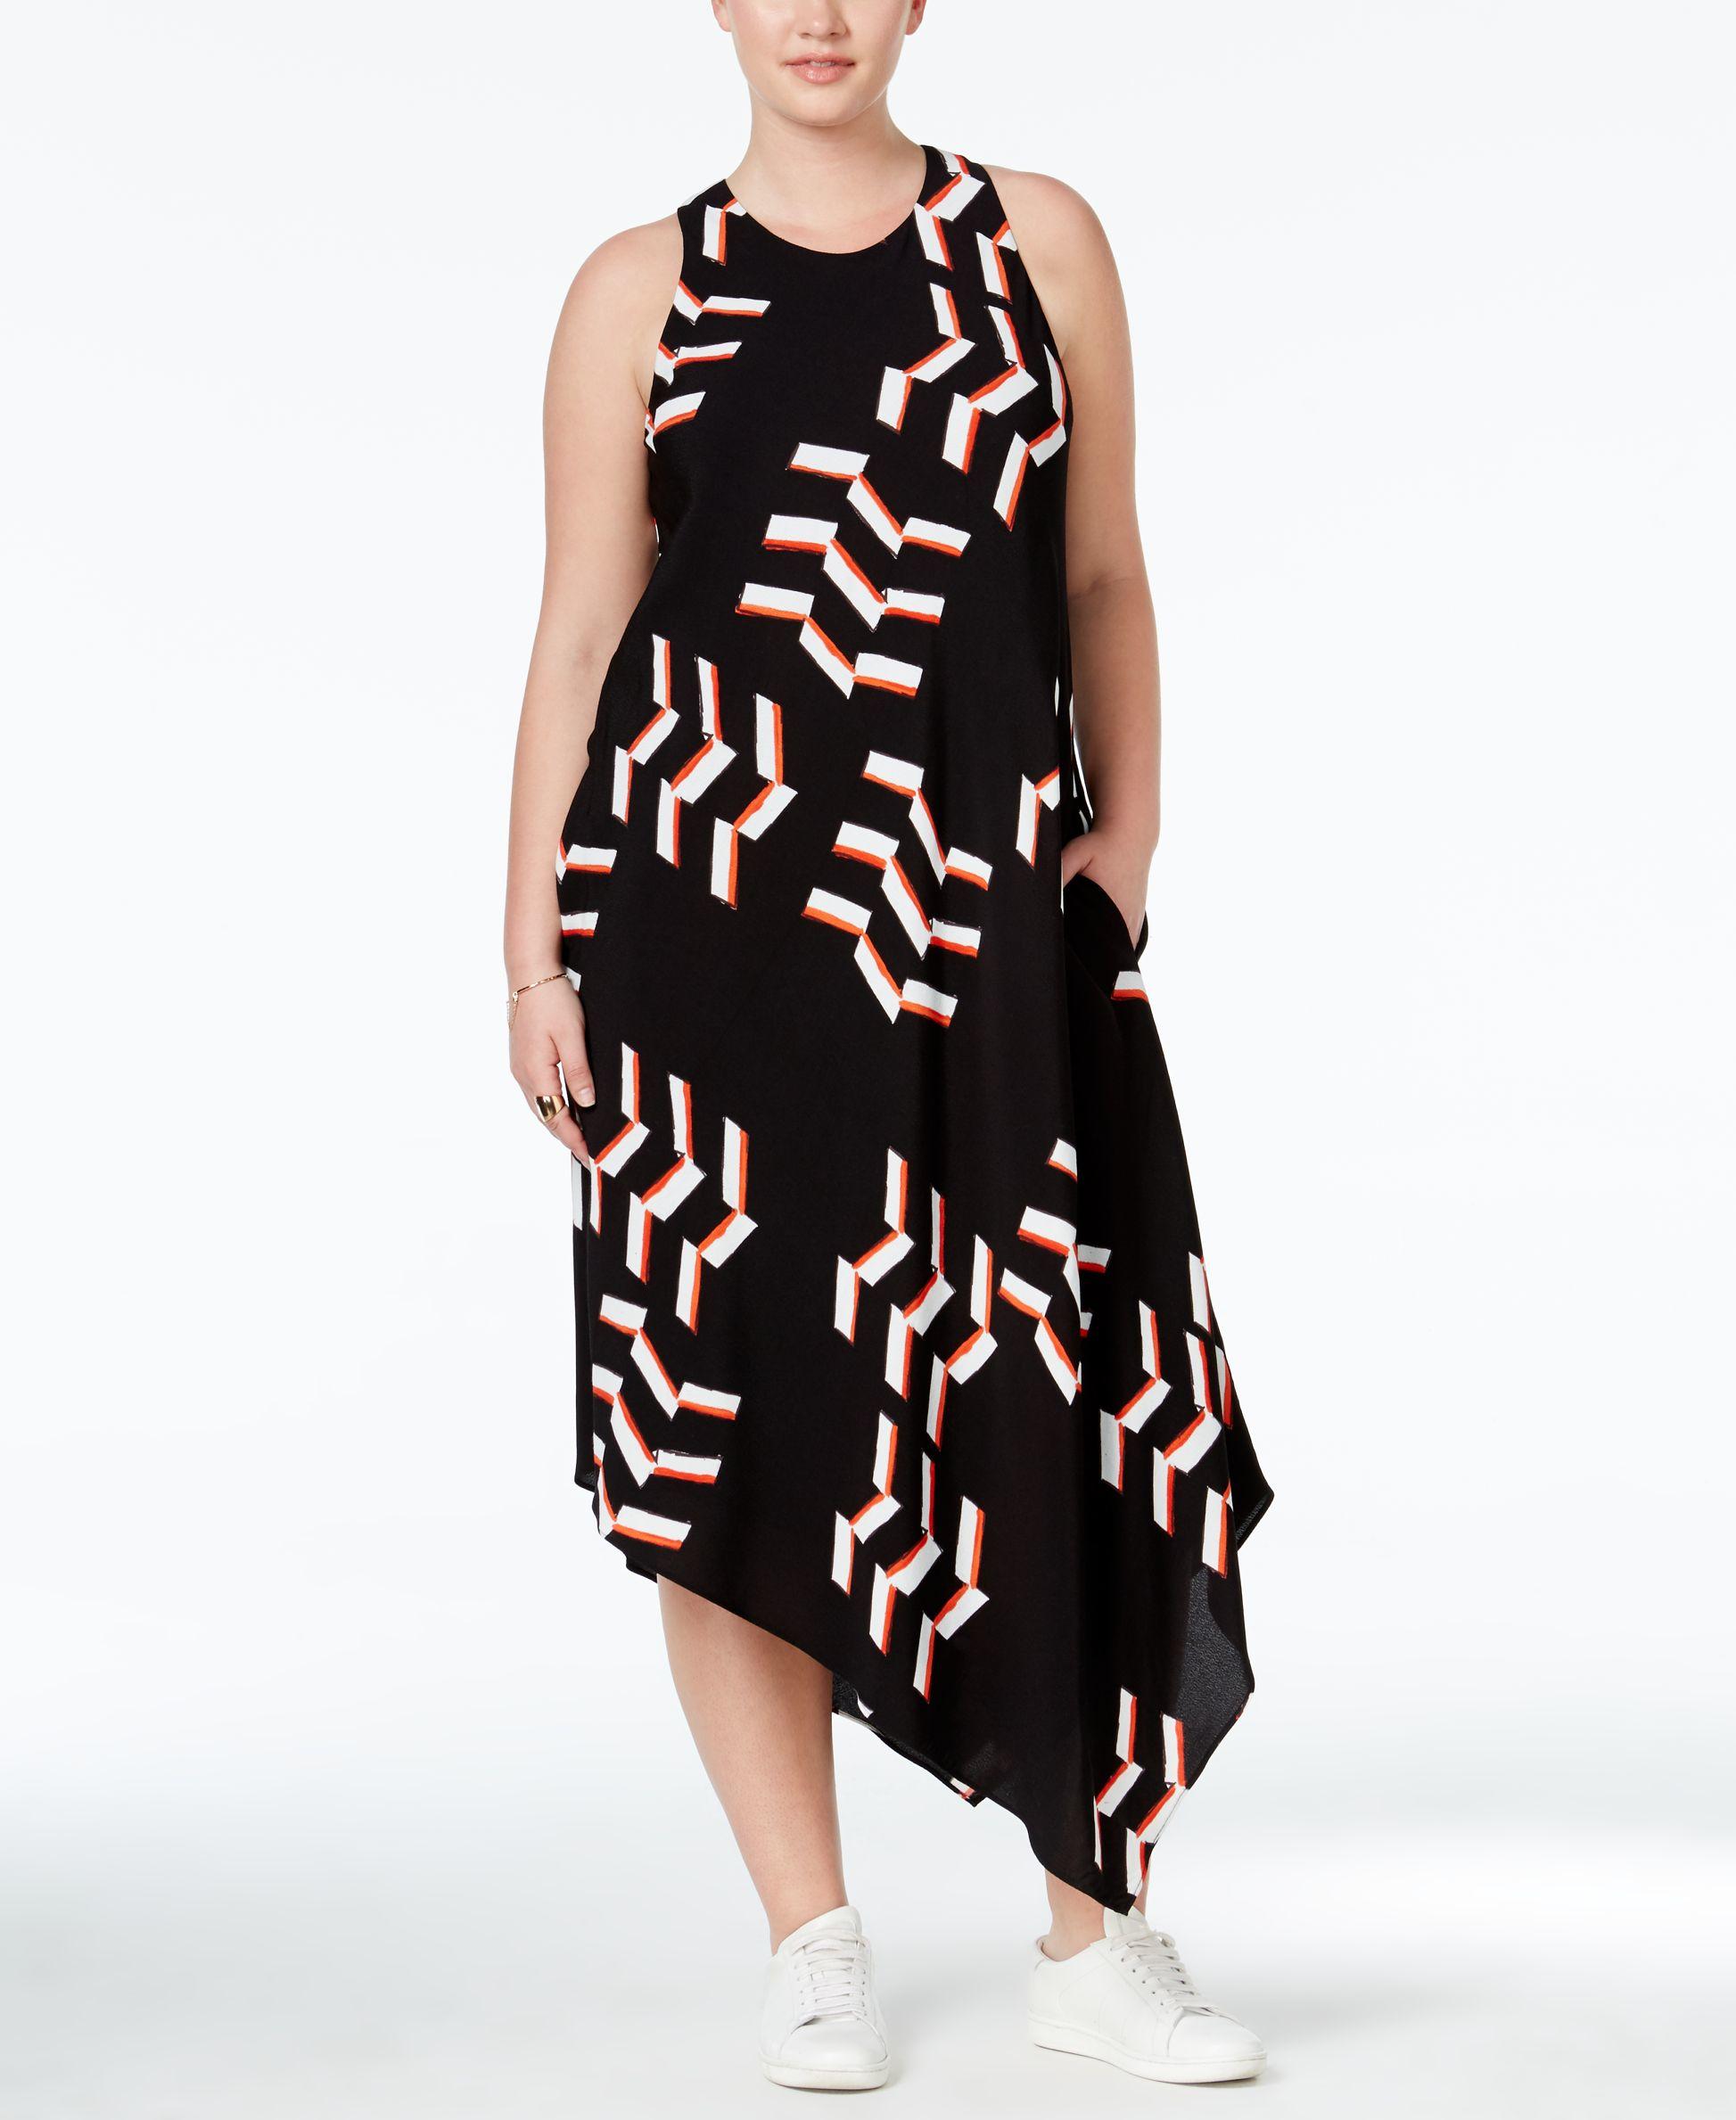 77a9f1a4c38 Lyst - RACHEL Rachel Roy Curvy Trendy Plus Size Printed Asymmetrical ...